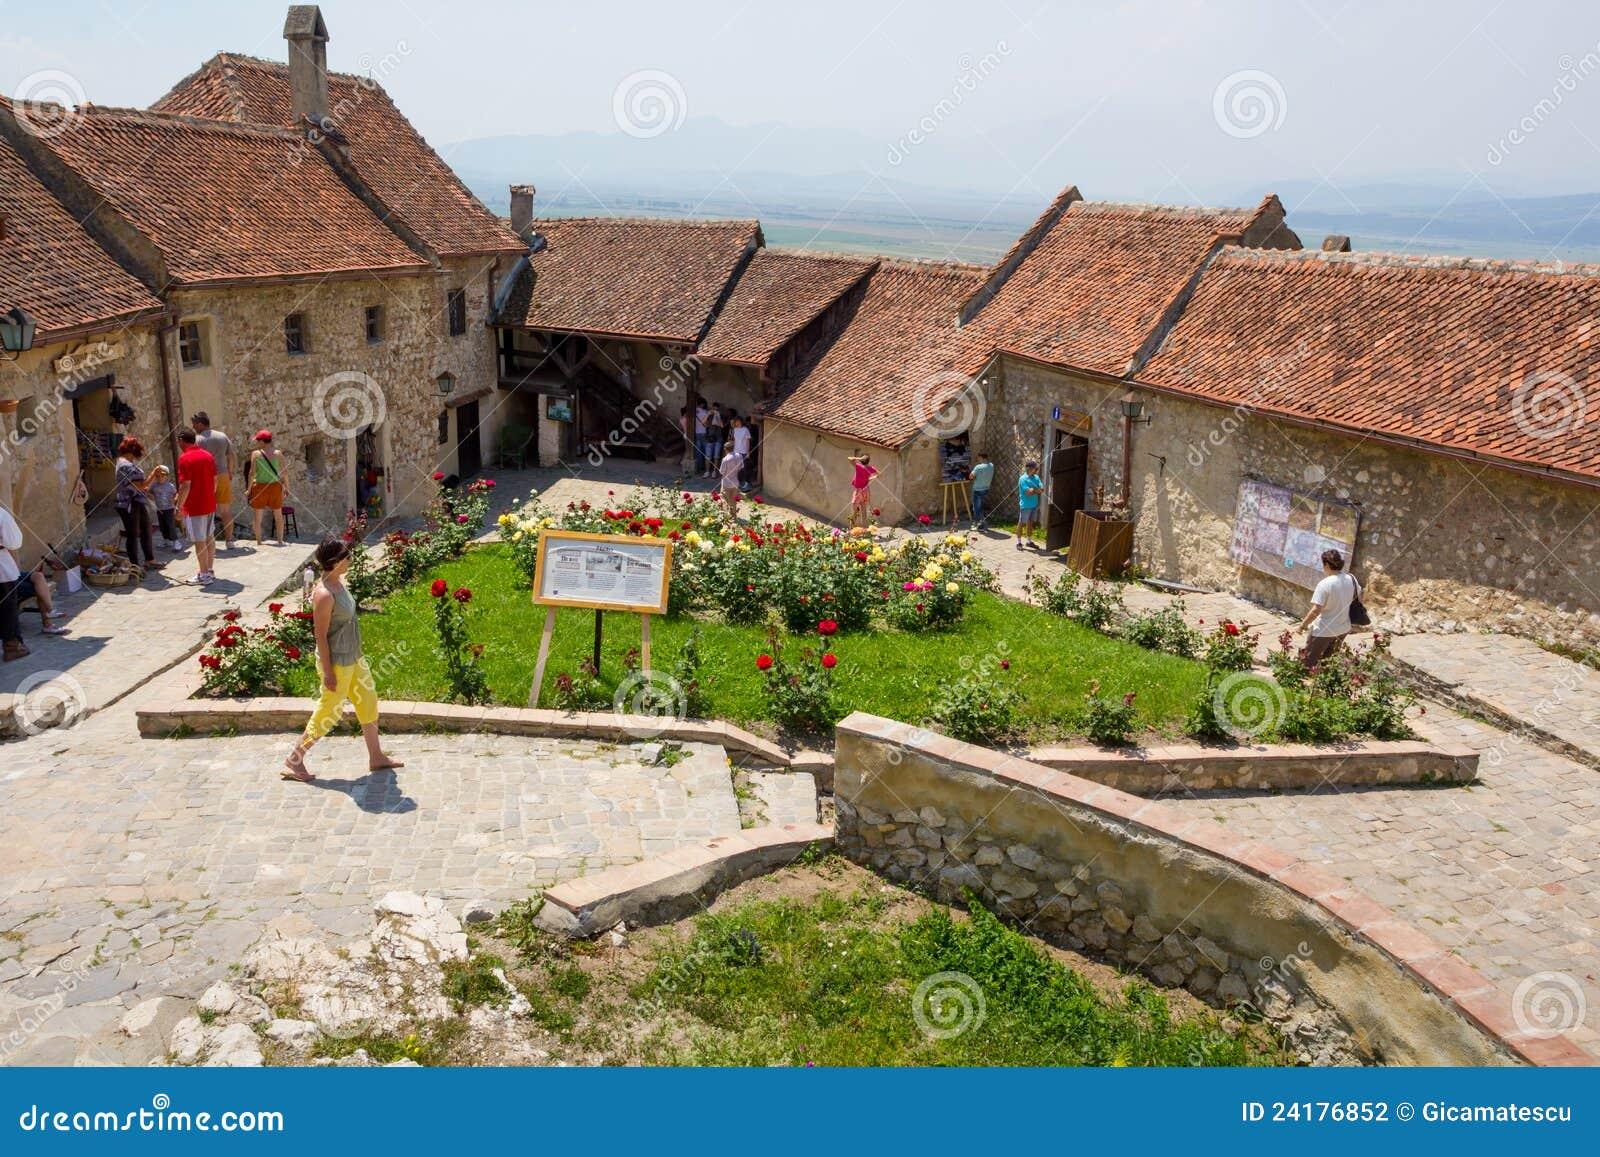 Peasant fortress